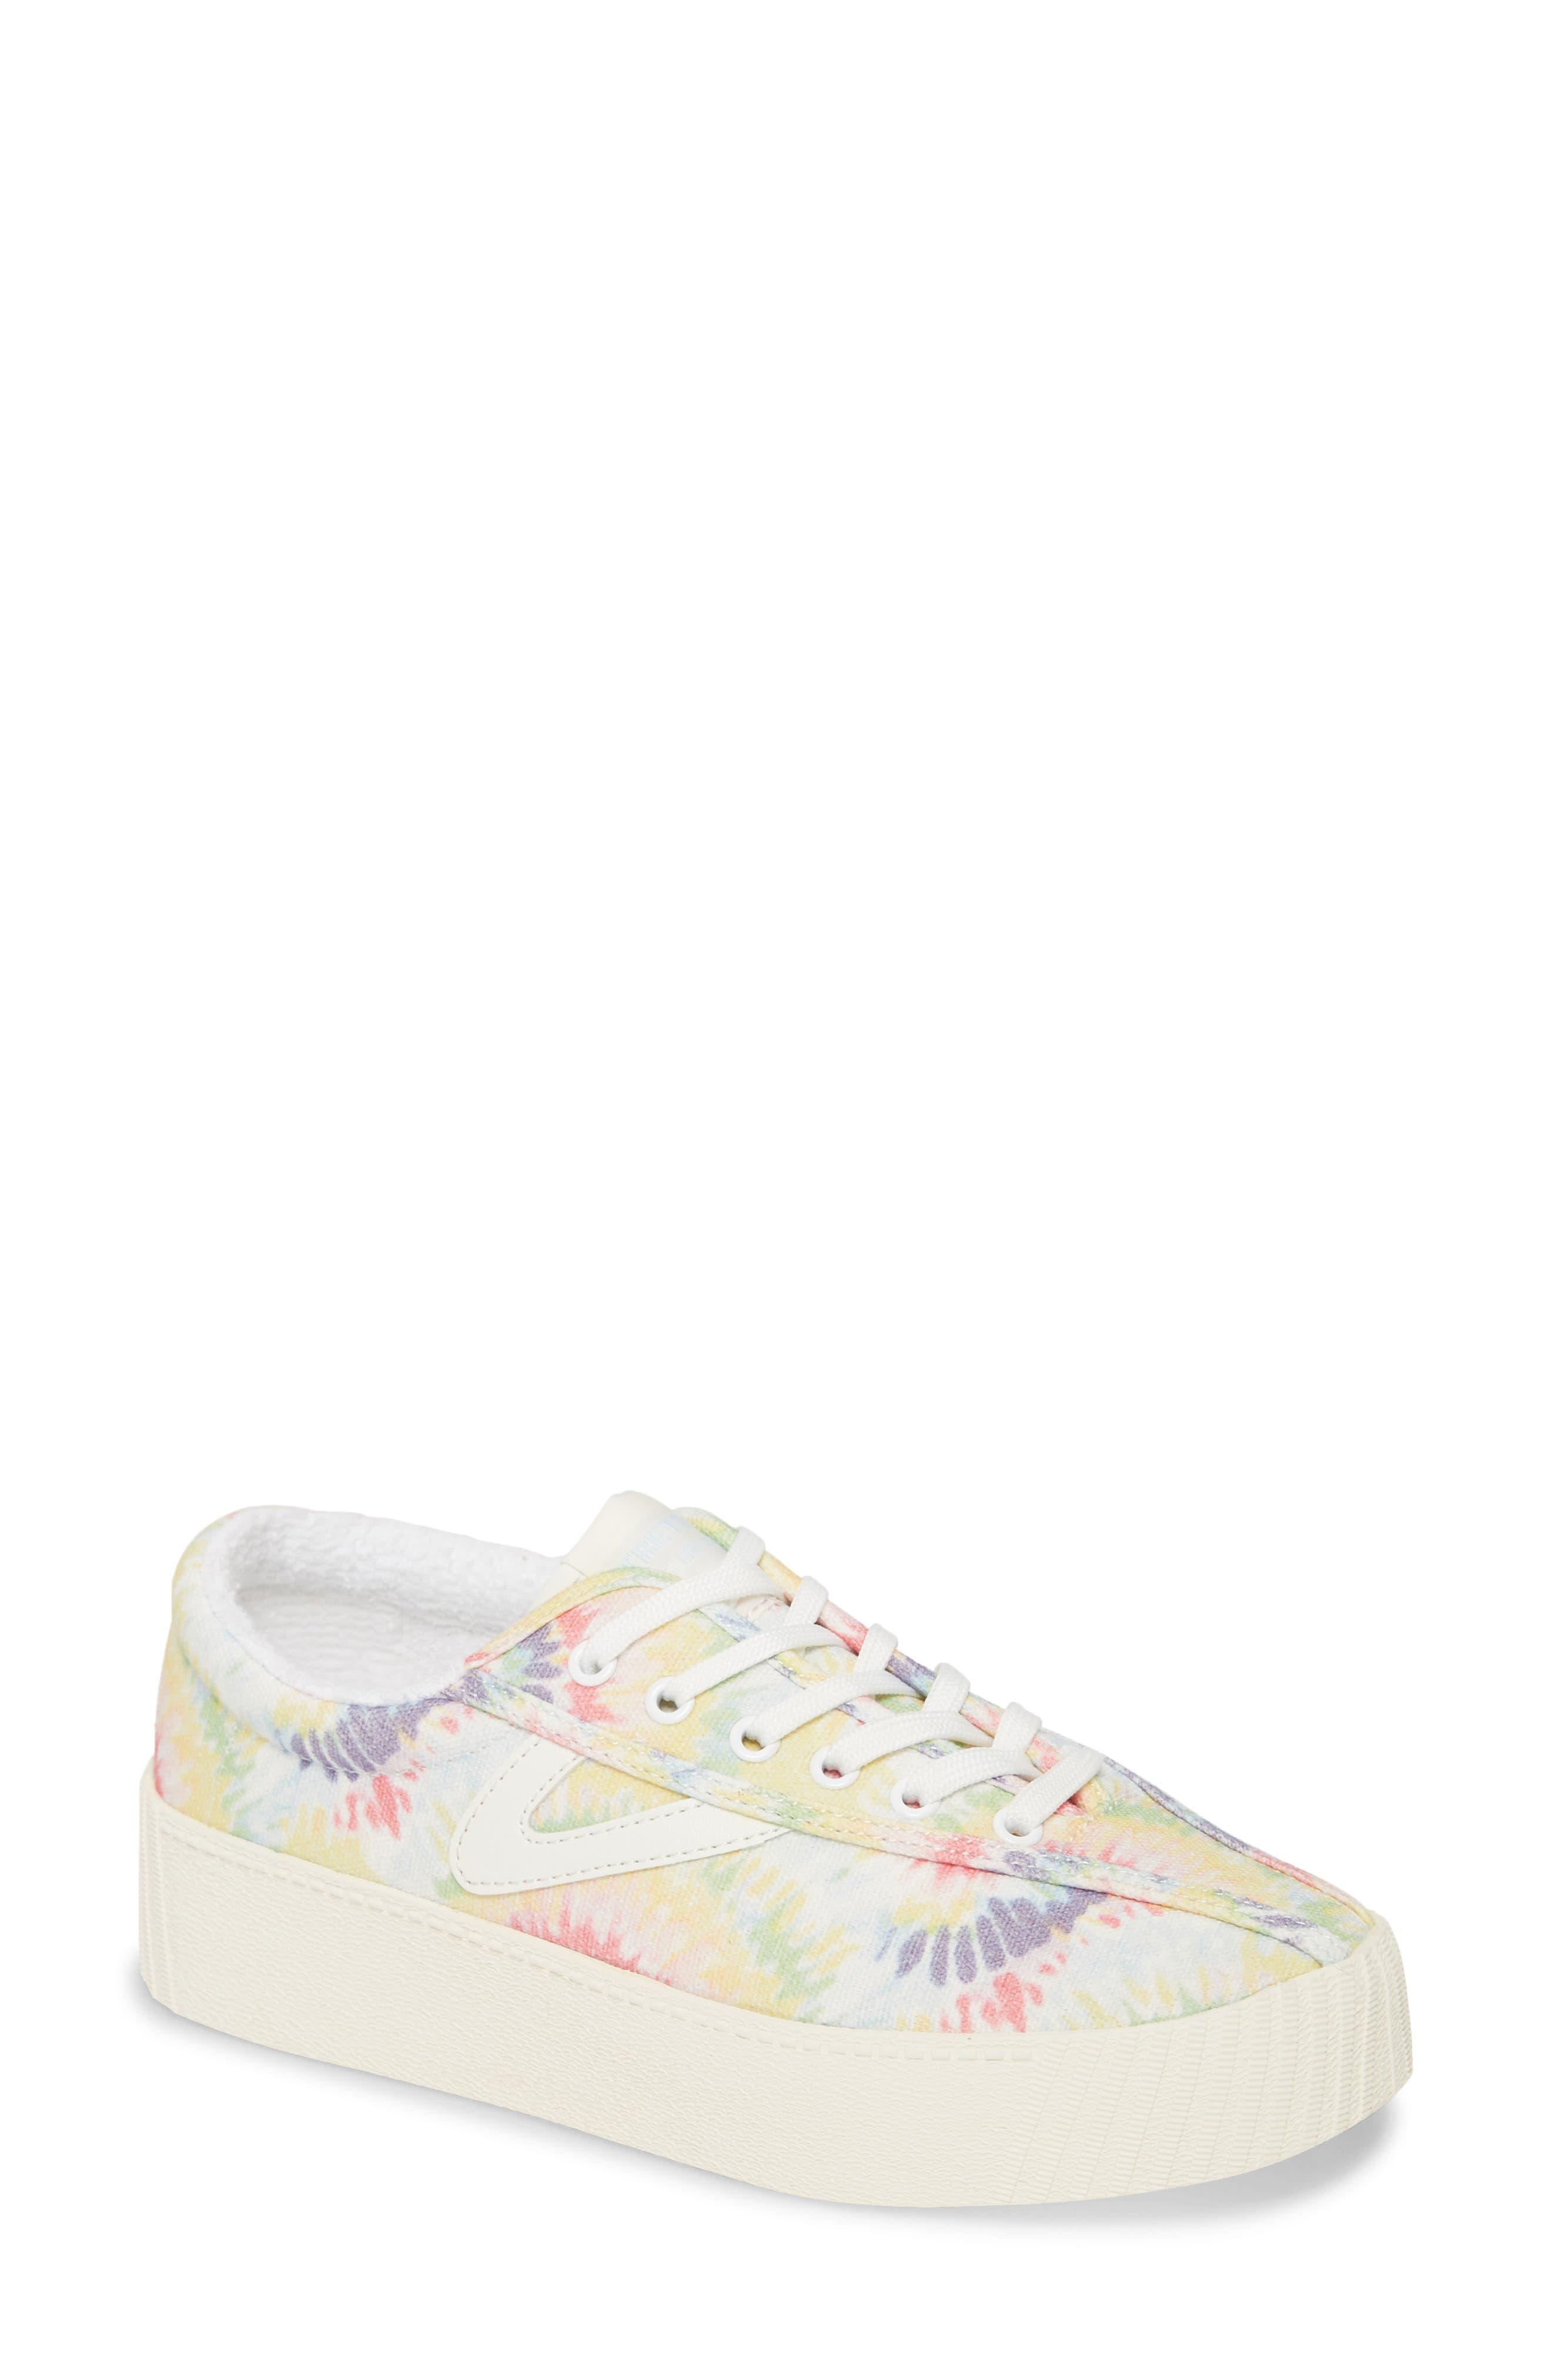 Women's Tretorn Shoes Sale \u0026 Clearance